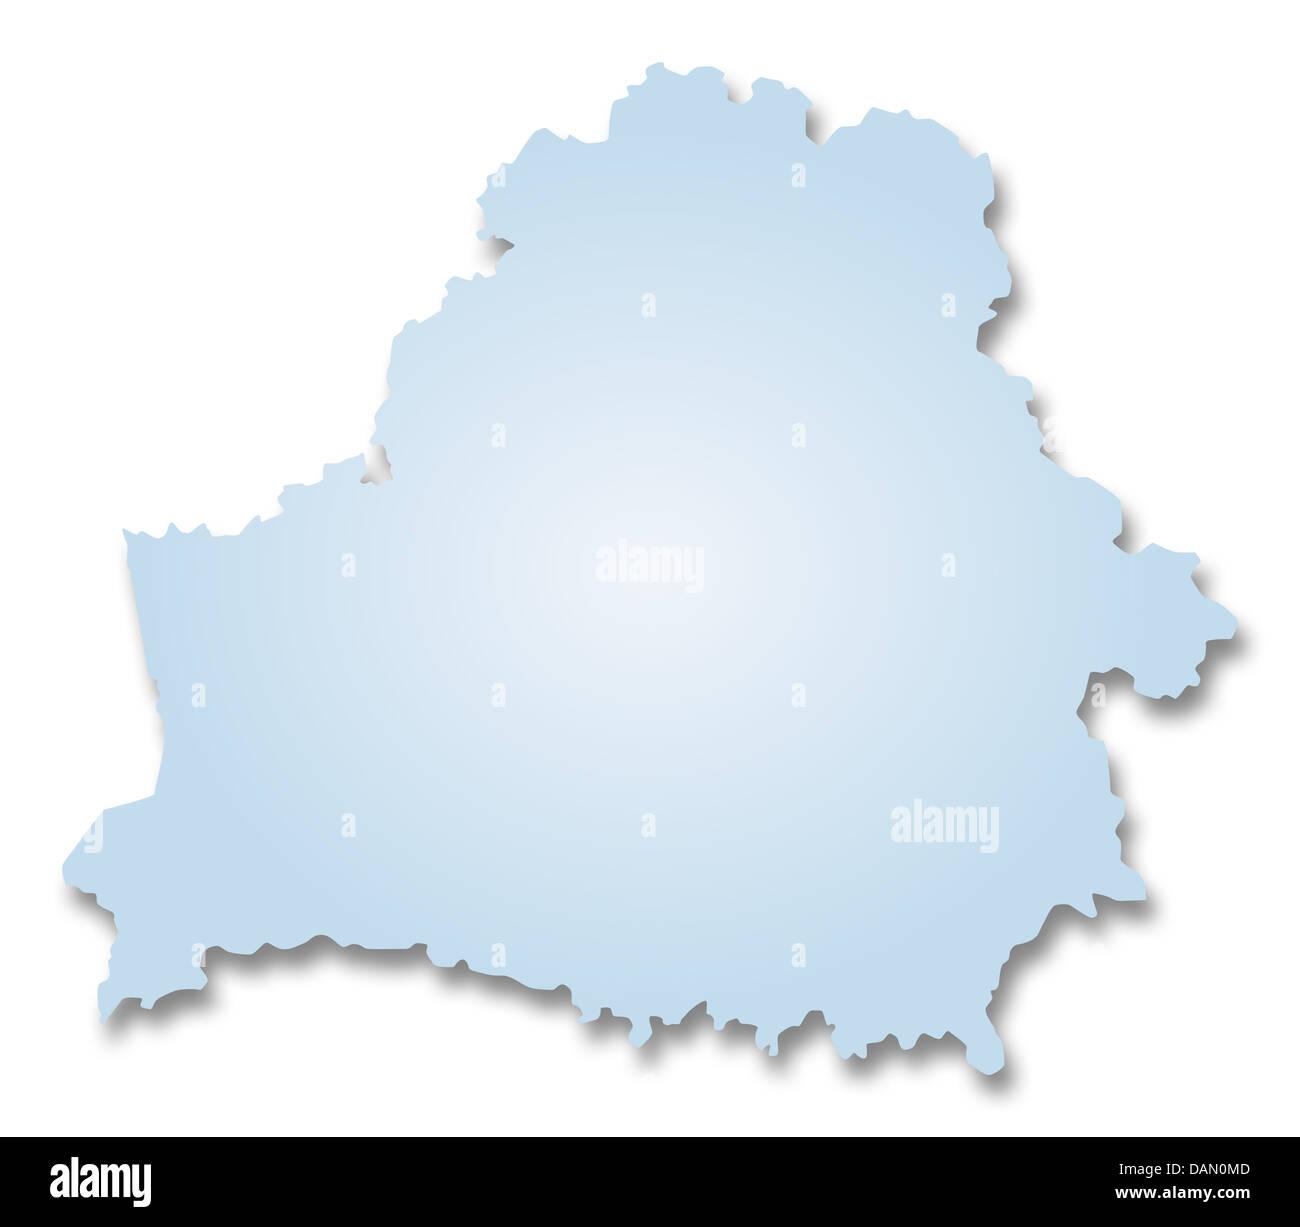 Map of Belarus - Stock Image